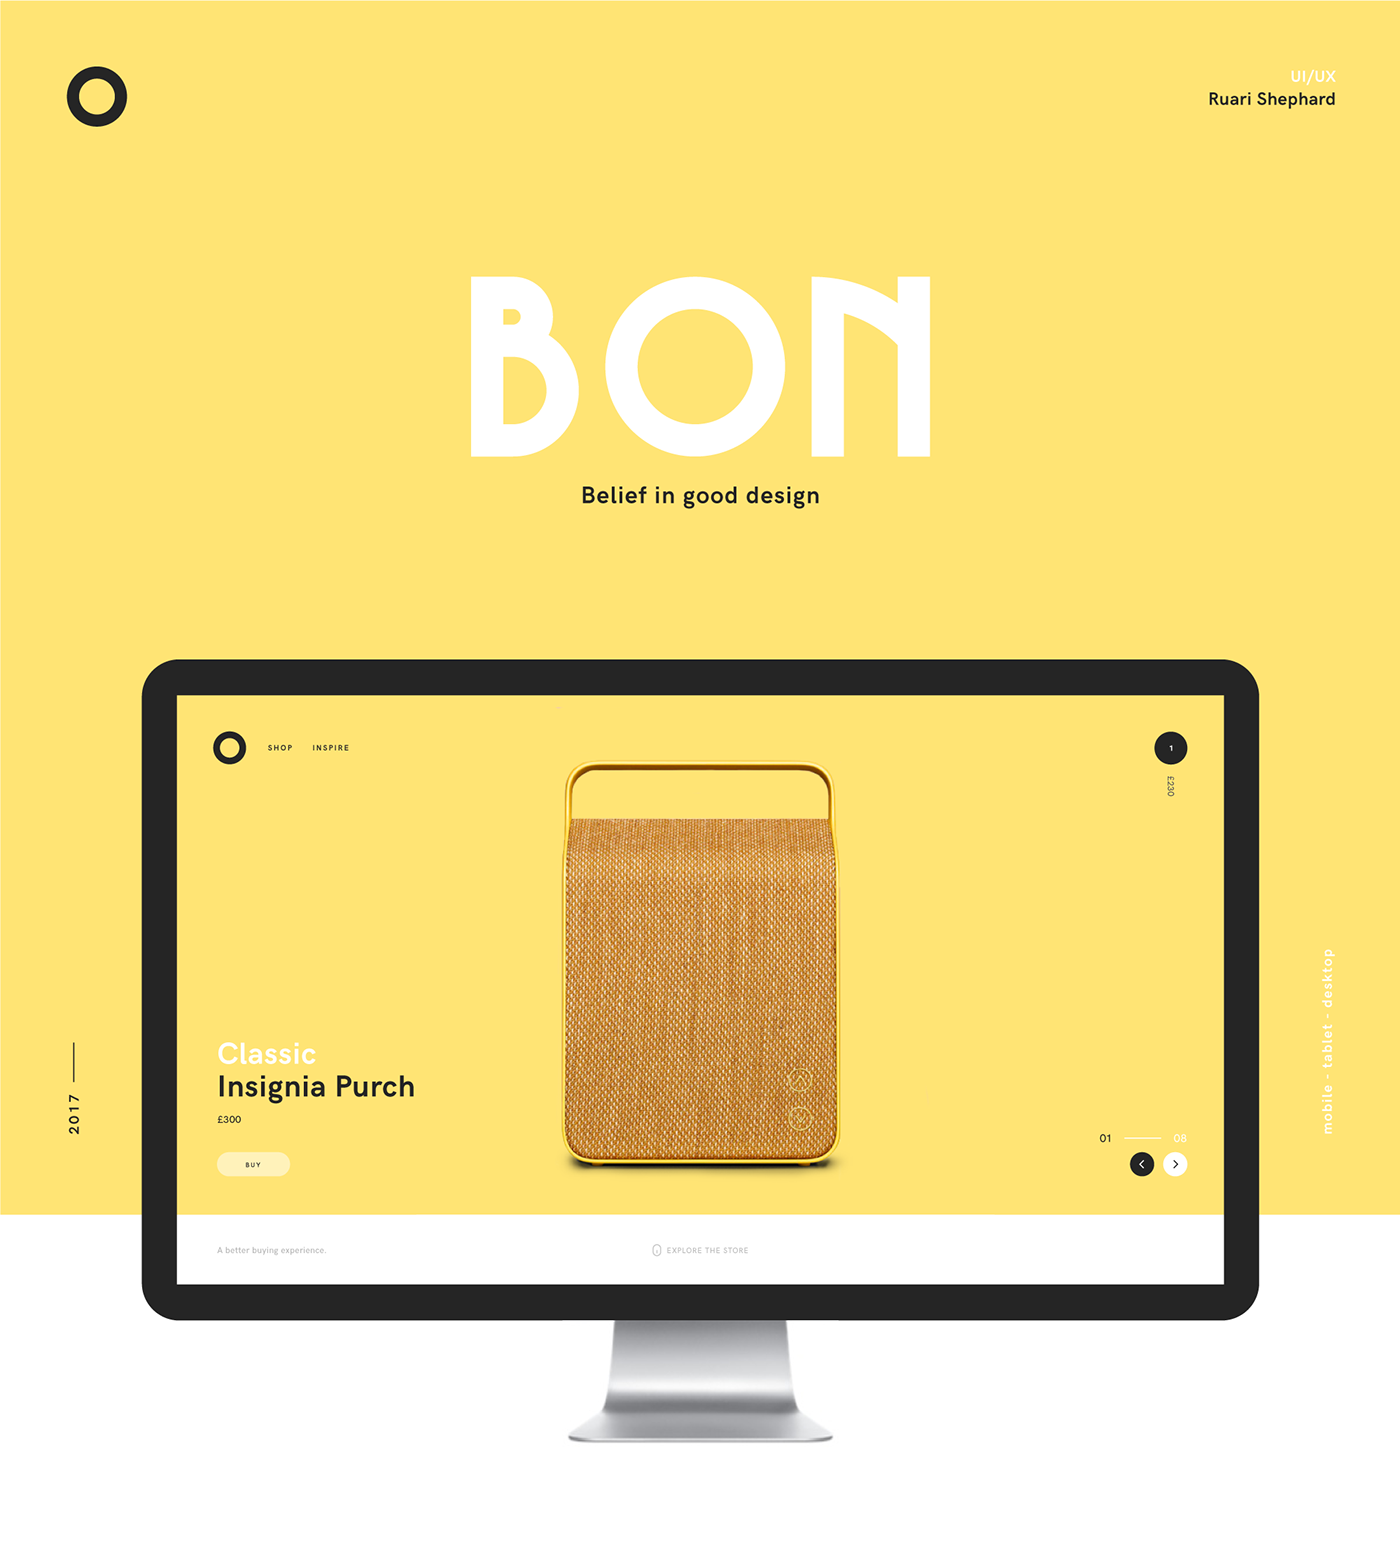 art direction  branding  Webdesign Interaction design  ux/ui graphic design  product design  design furniture shop